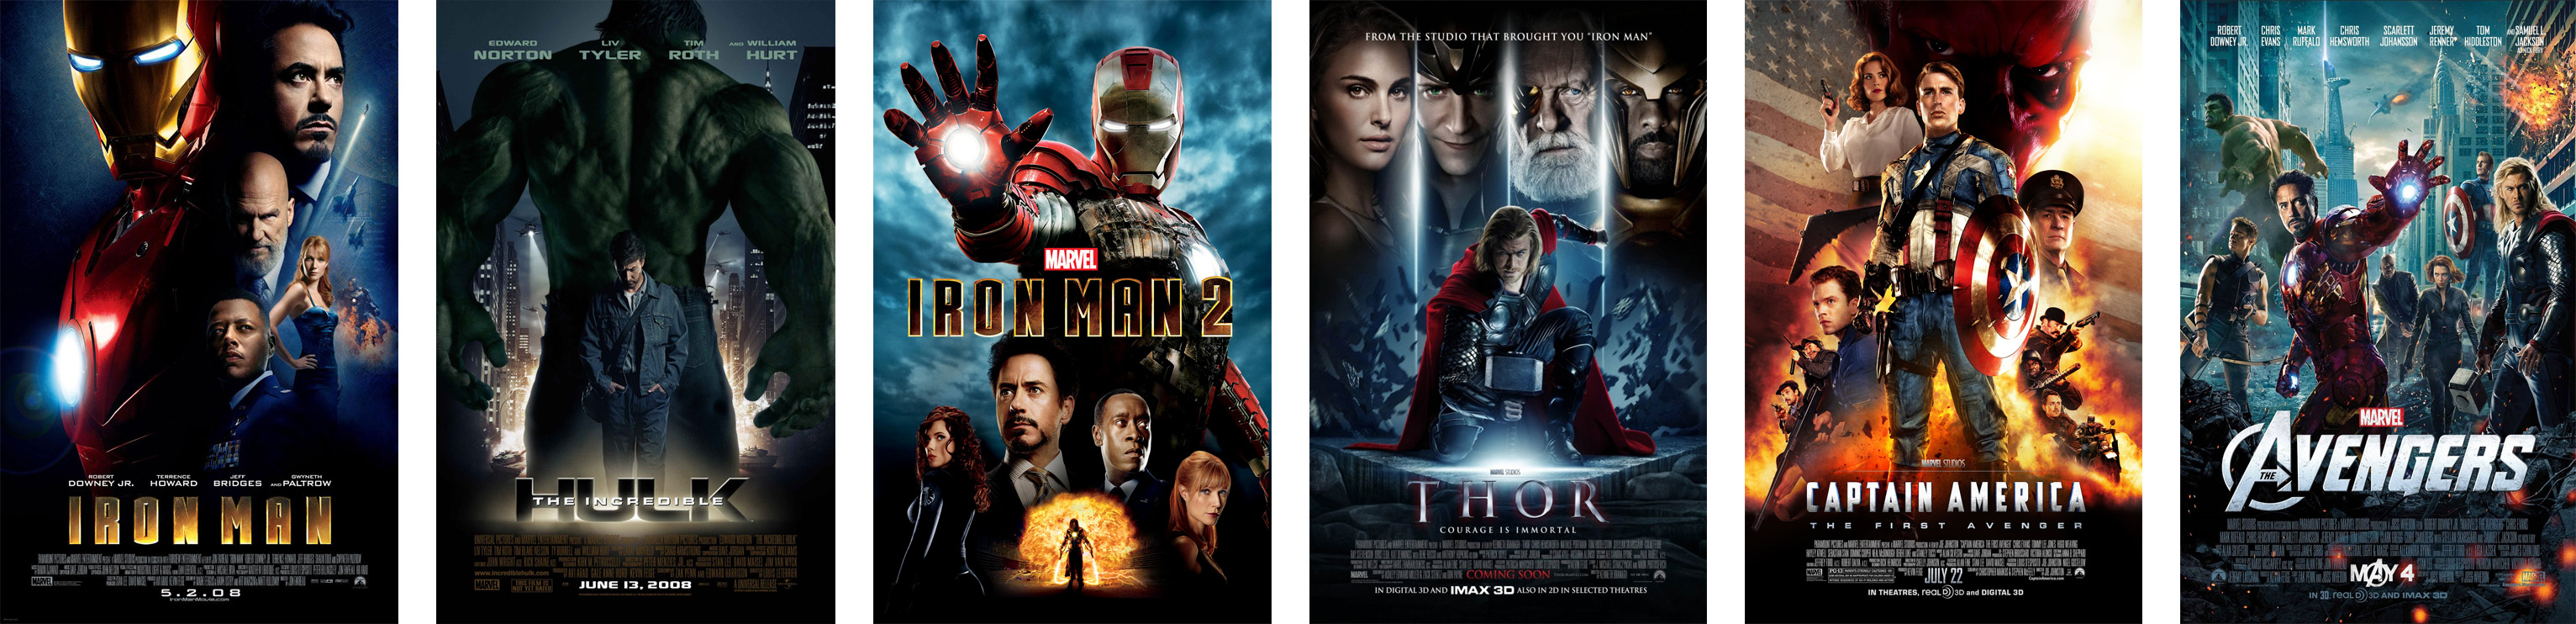 Marathon The Marvel Movies Before 'Avengers: Endgame' | The